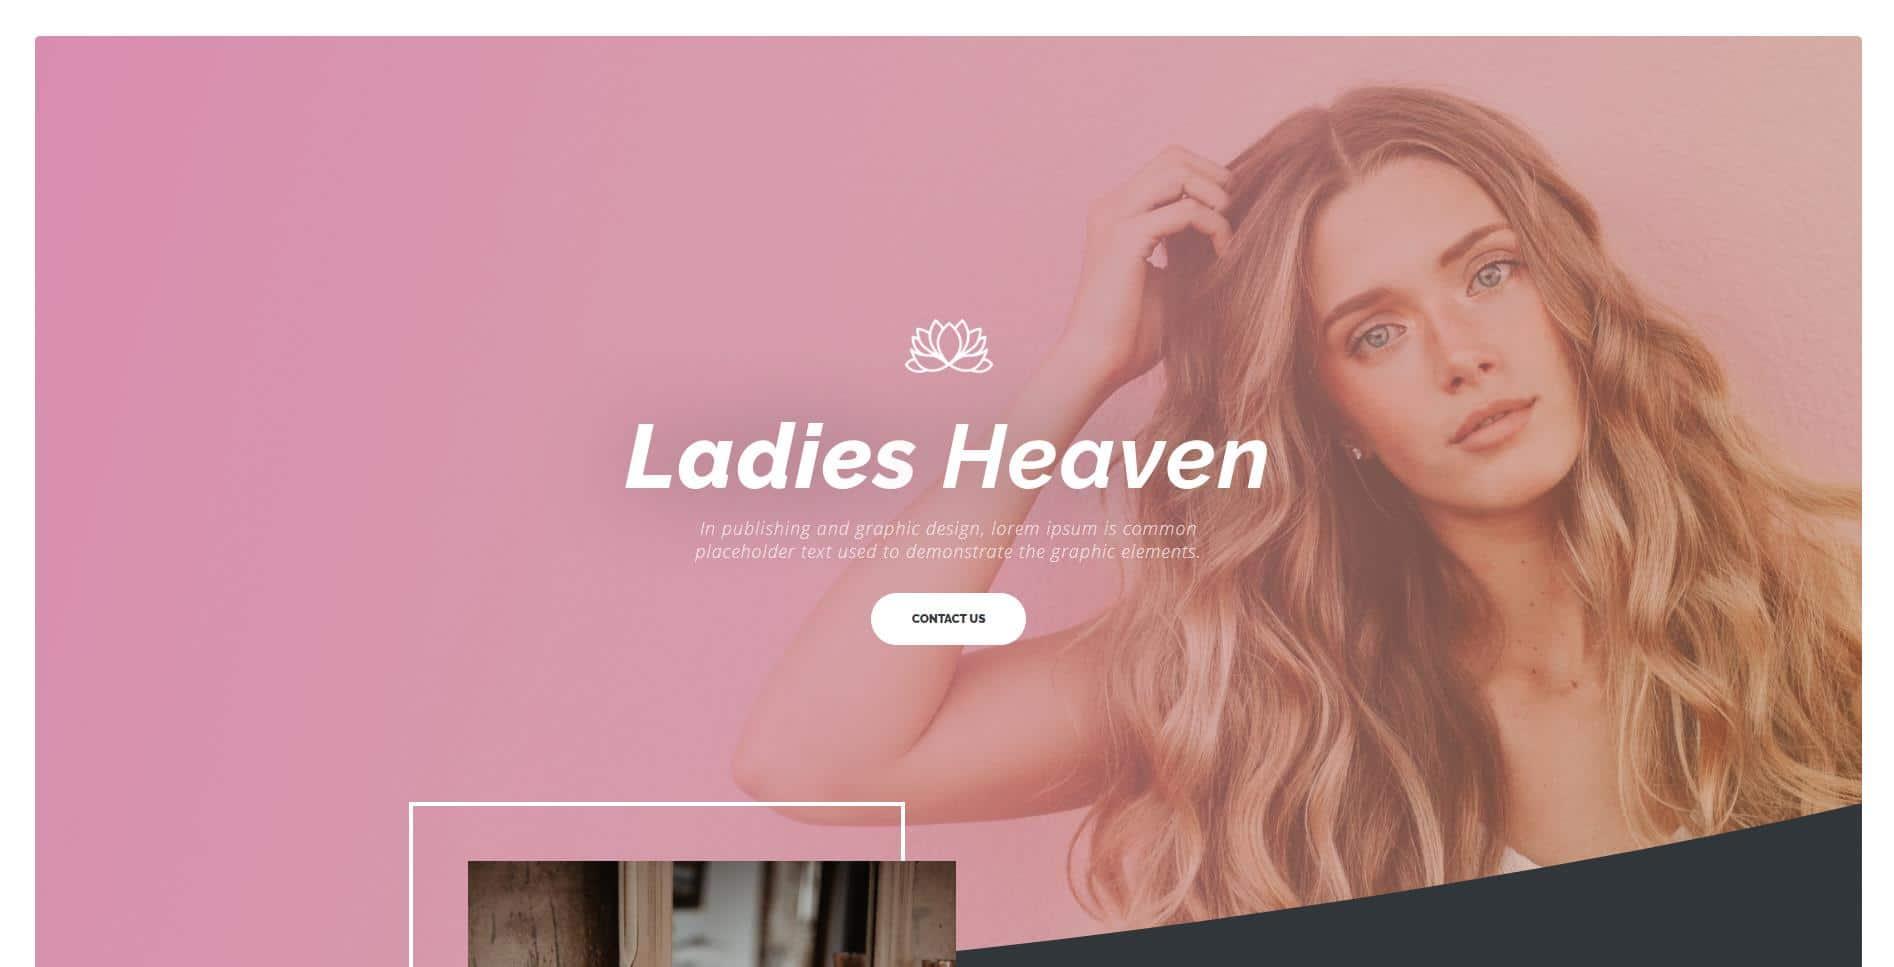 Beauty Salon Website Design